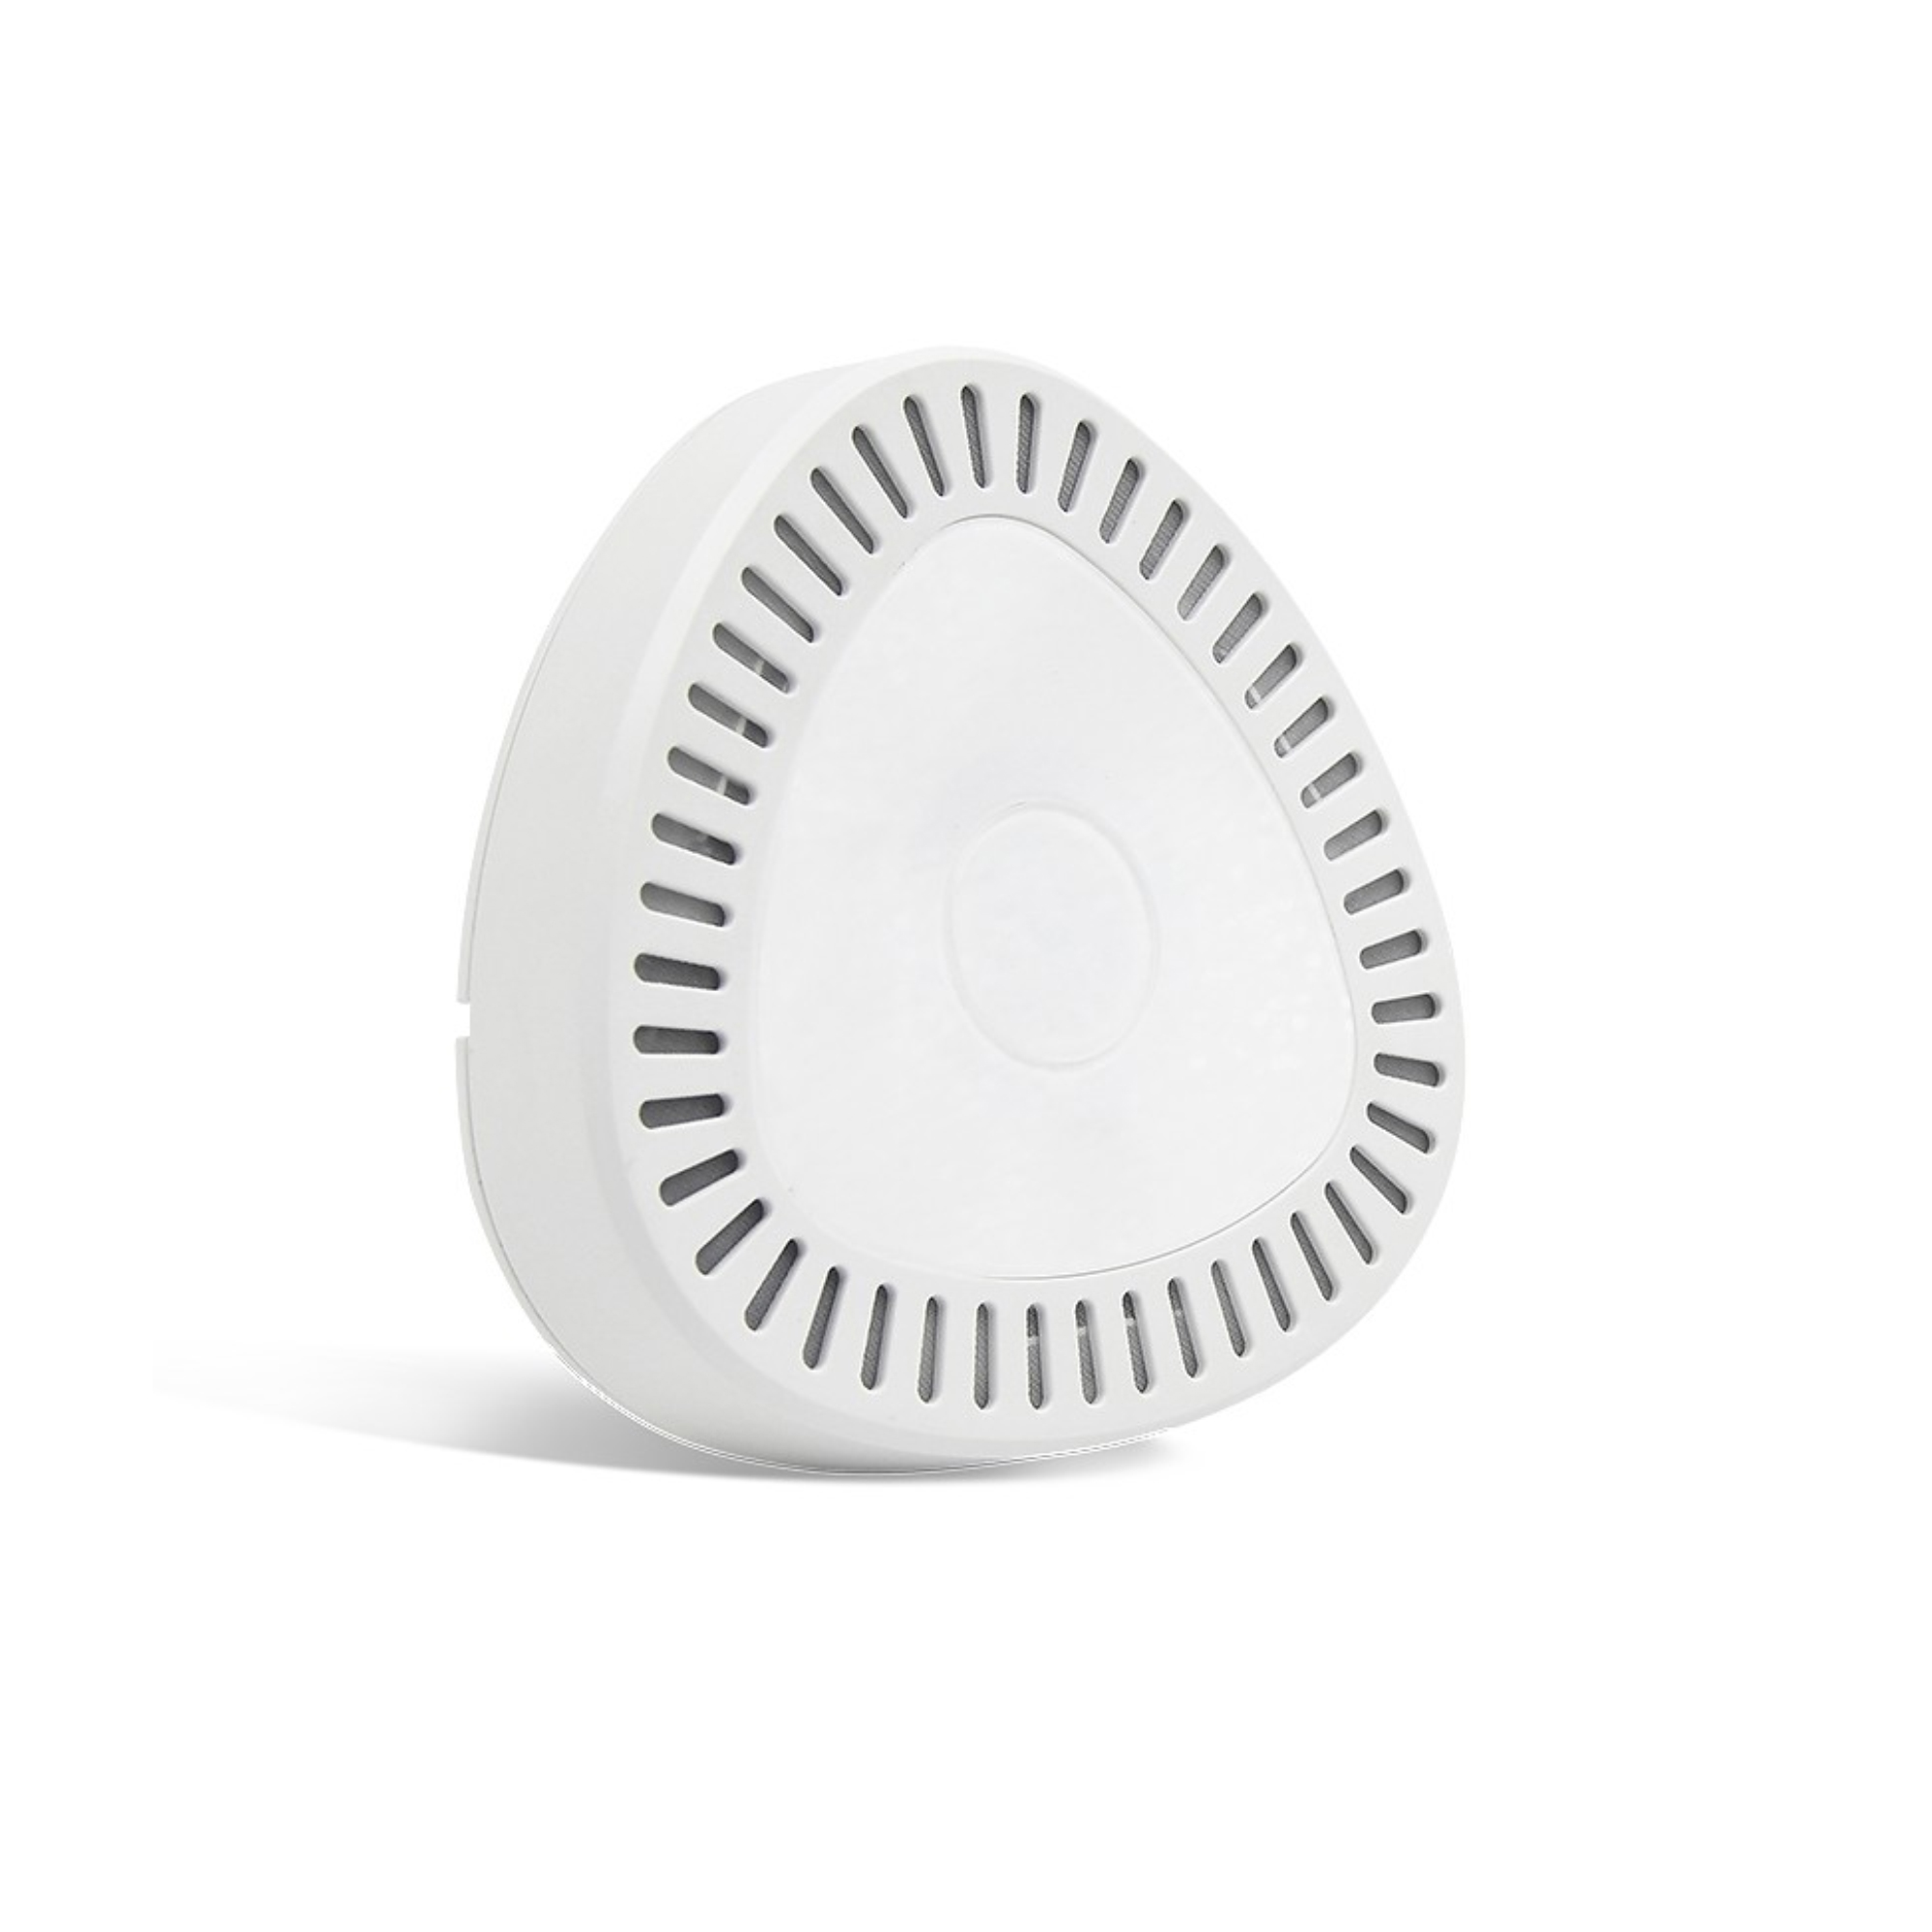 Sensref Bluetooth Tabanlı Bataryalı Duman Sensörü